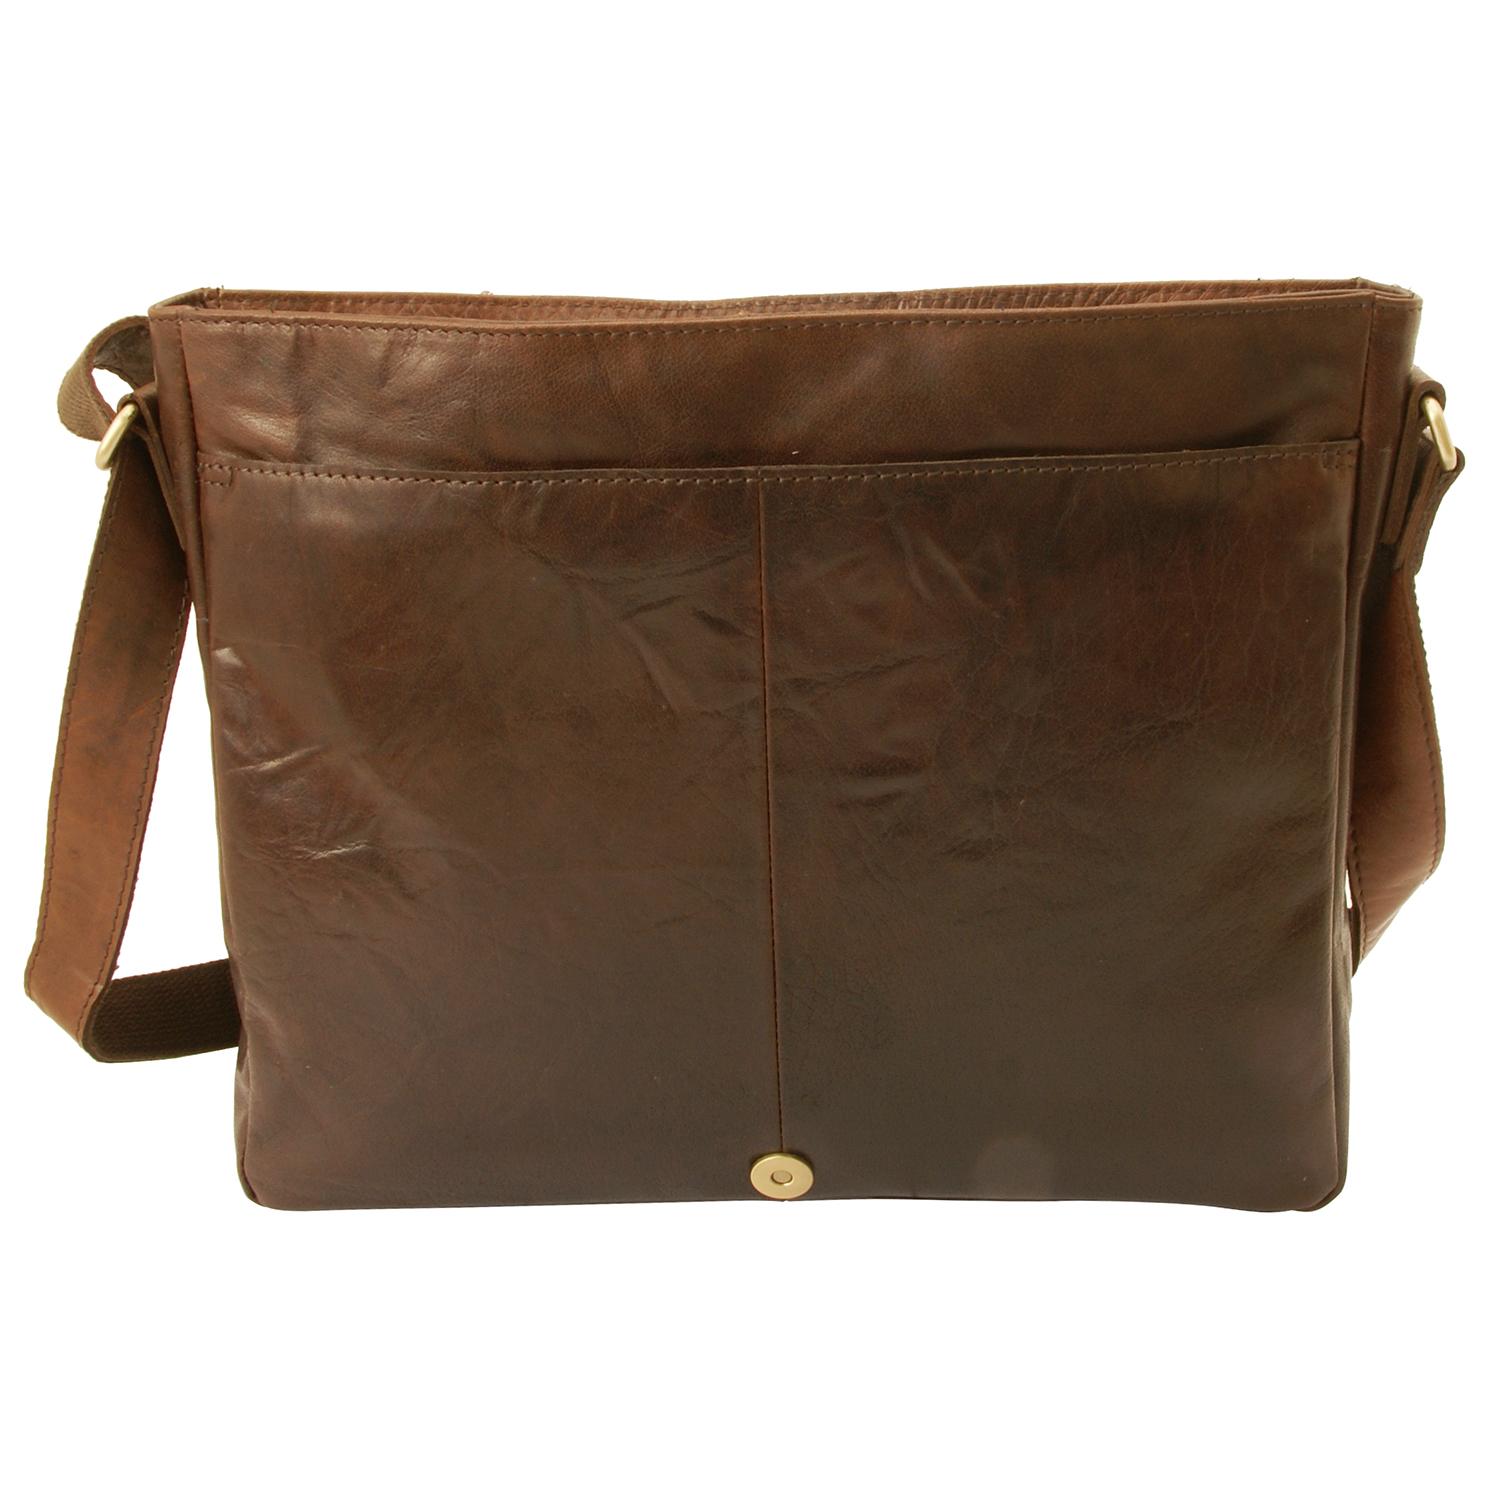 Rowallan – Brown East/West Medium Conquest Messenger Bag in Buffalo Leather